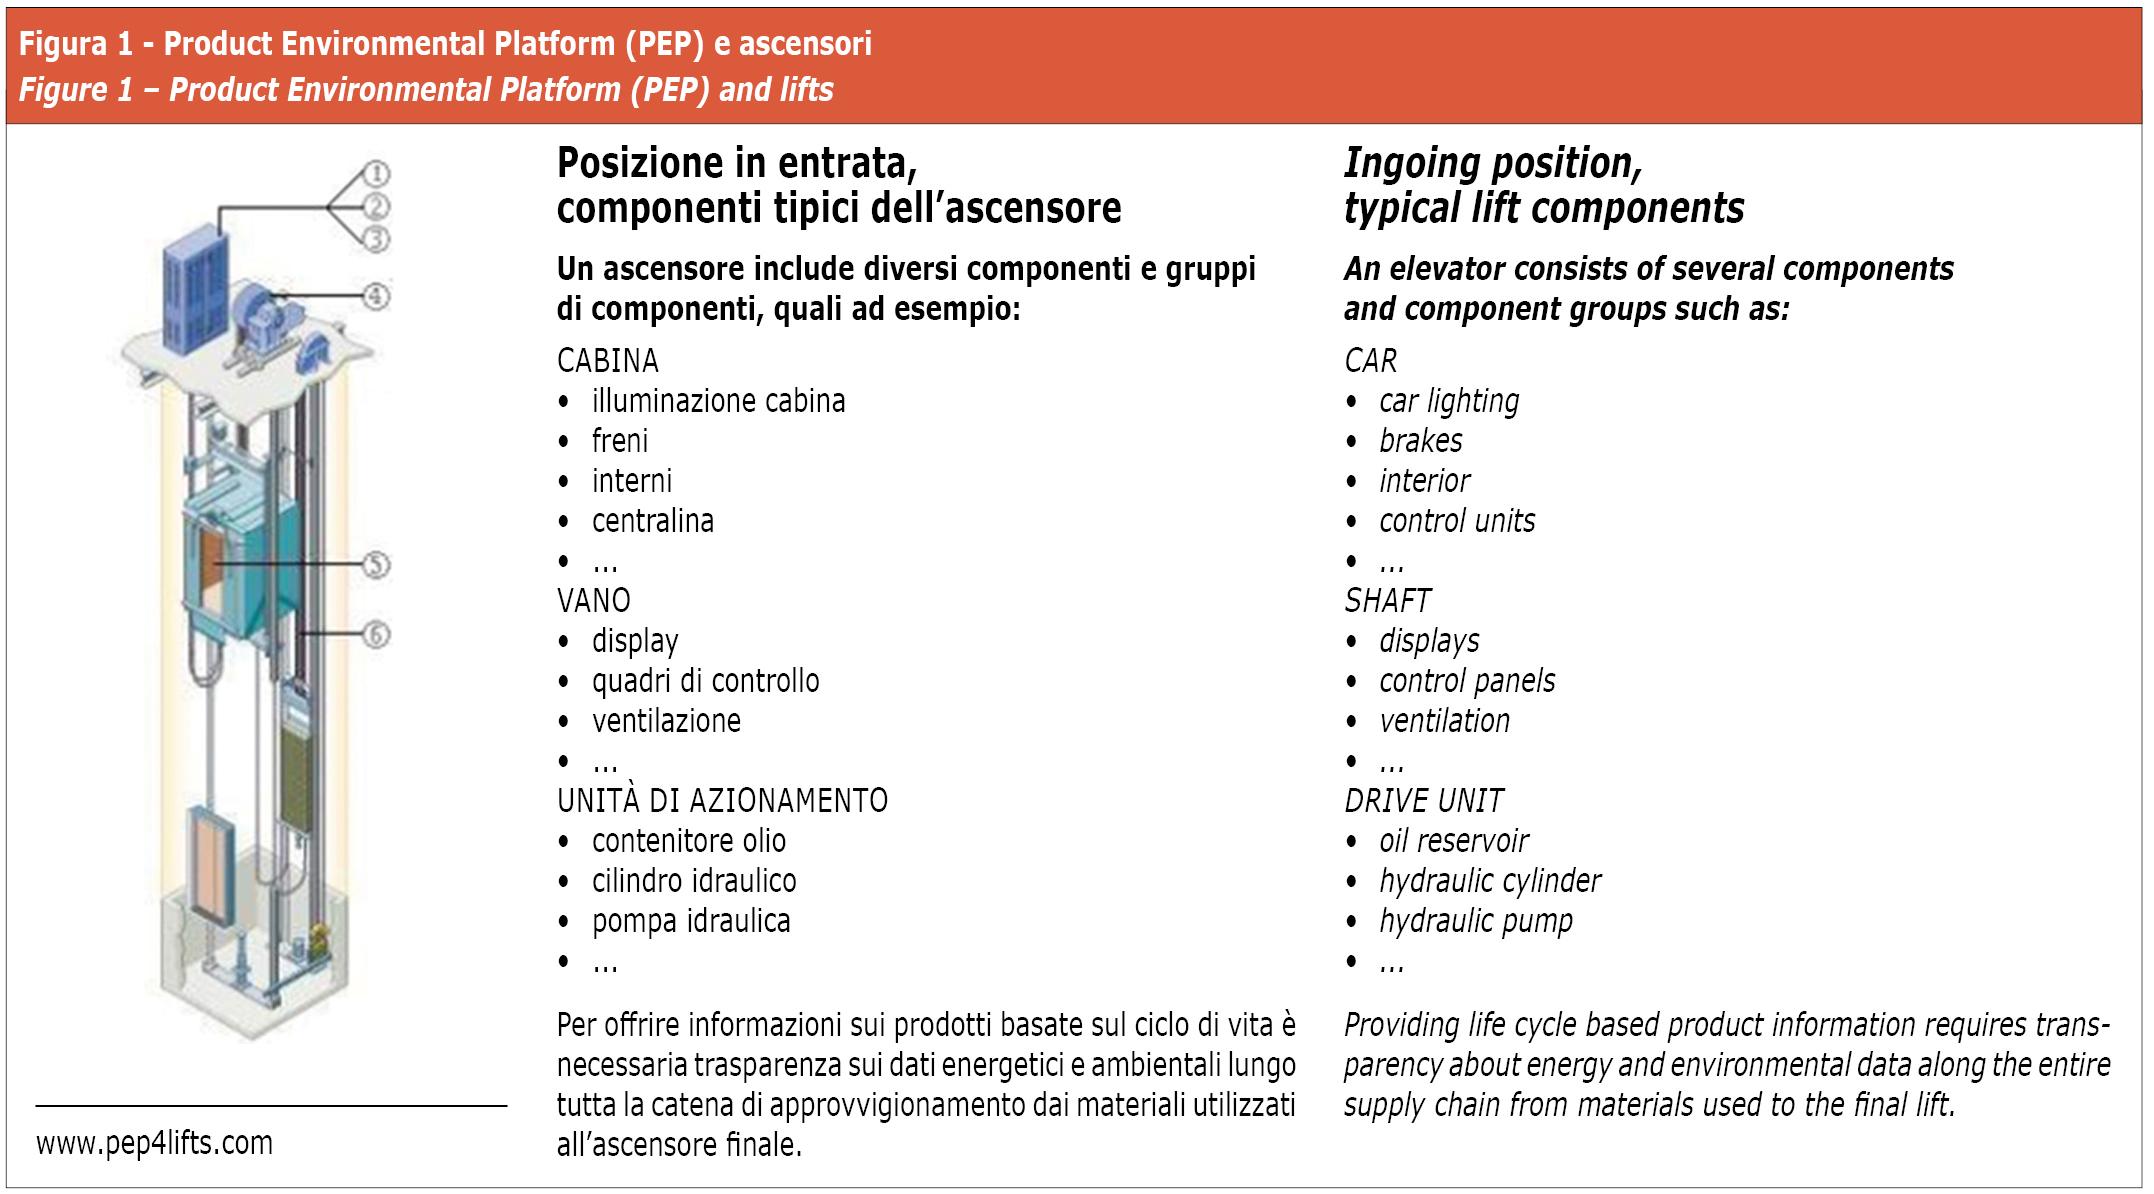 Product environmental platform (PEP) e ascensori